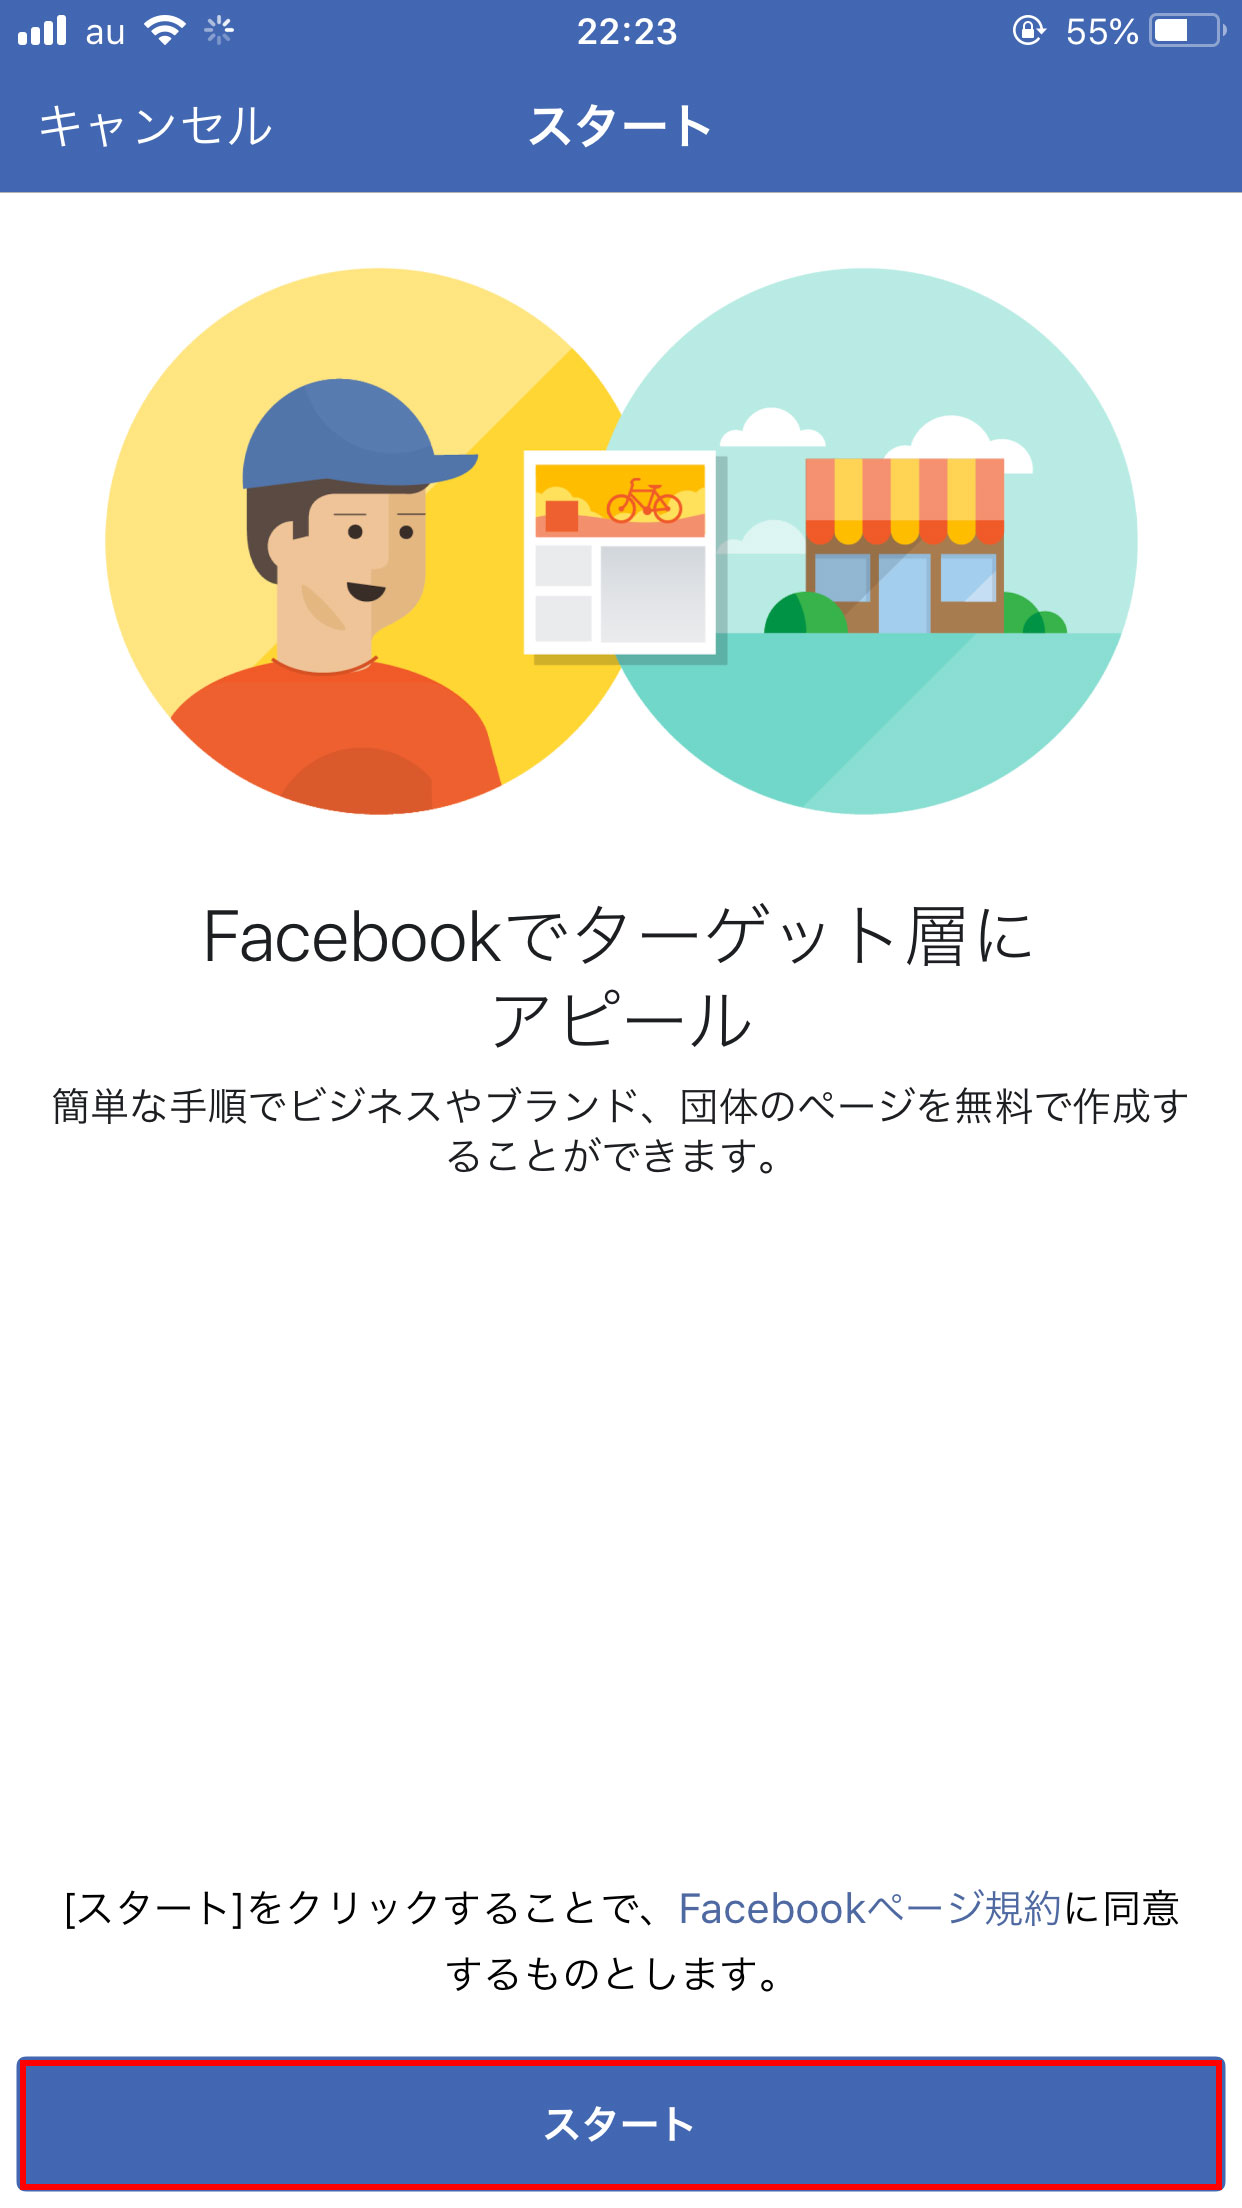 Facebookページ作成のスタート画面